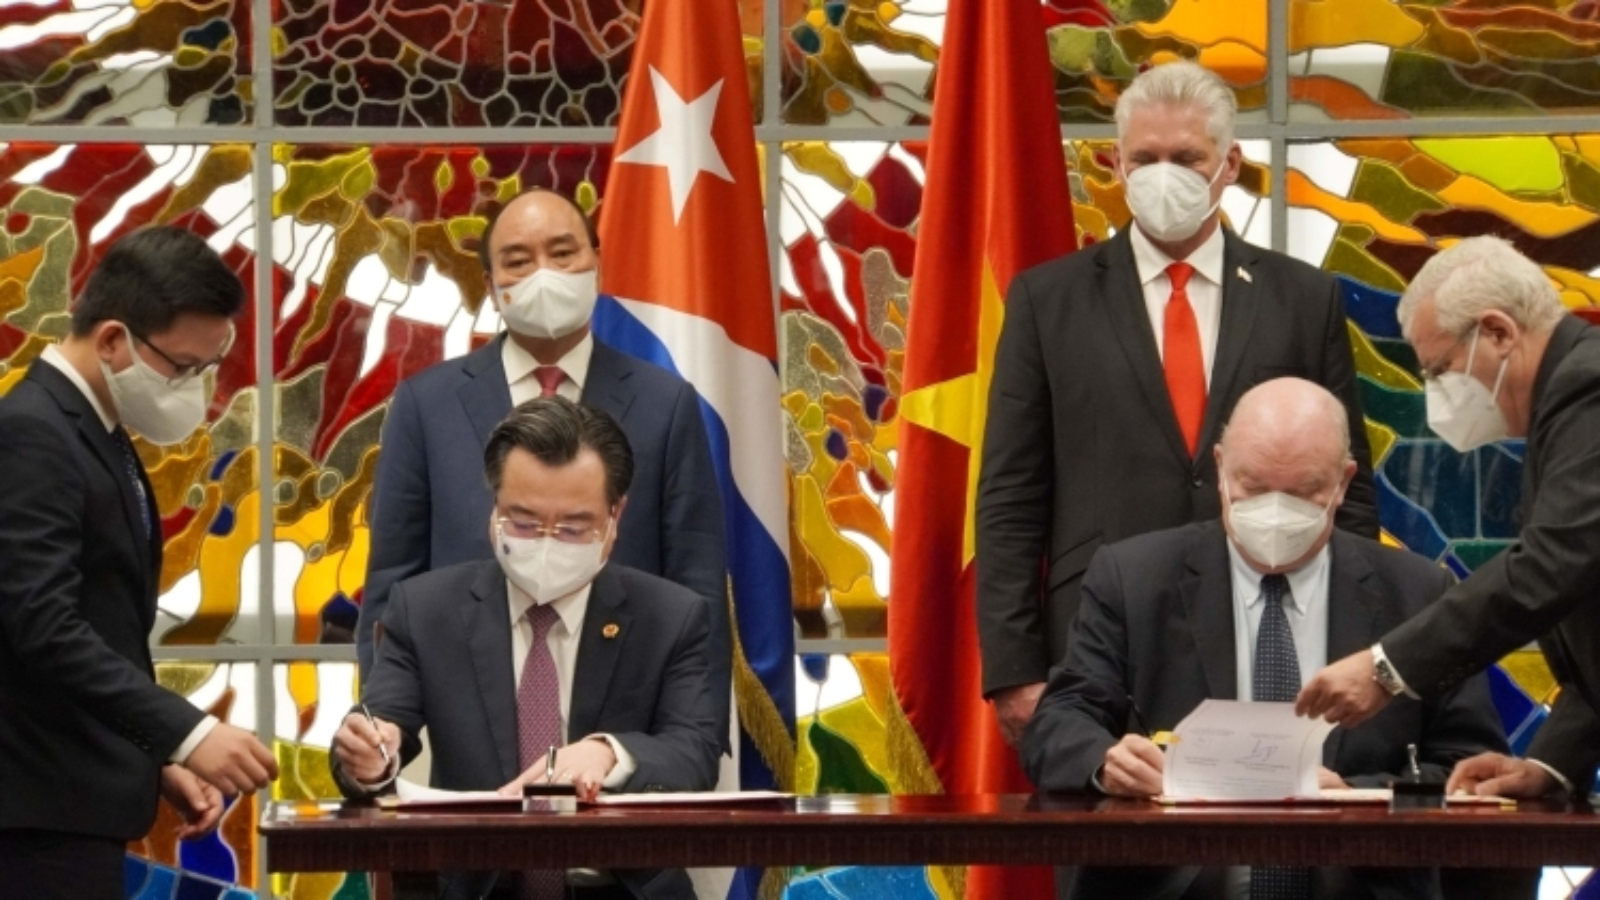 Cuba prioritises vaccine supply, technology transfer to Vietnam